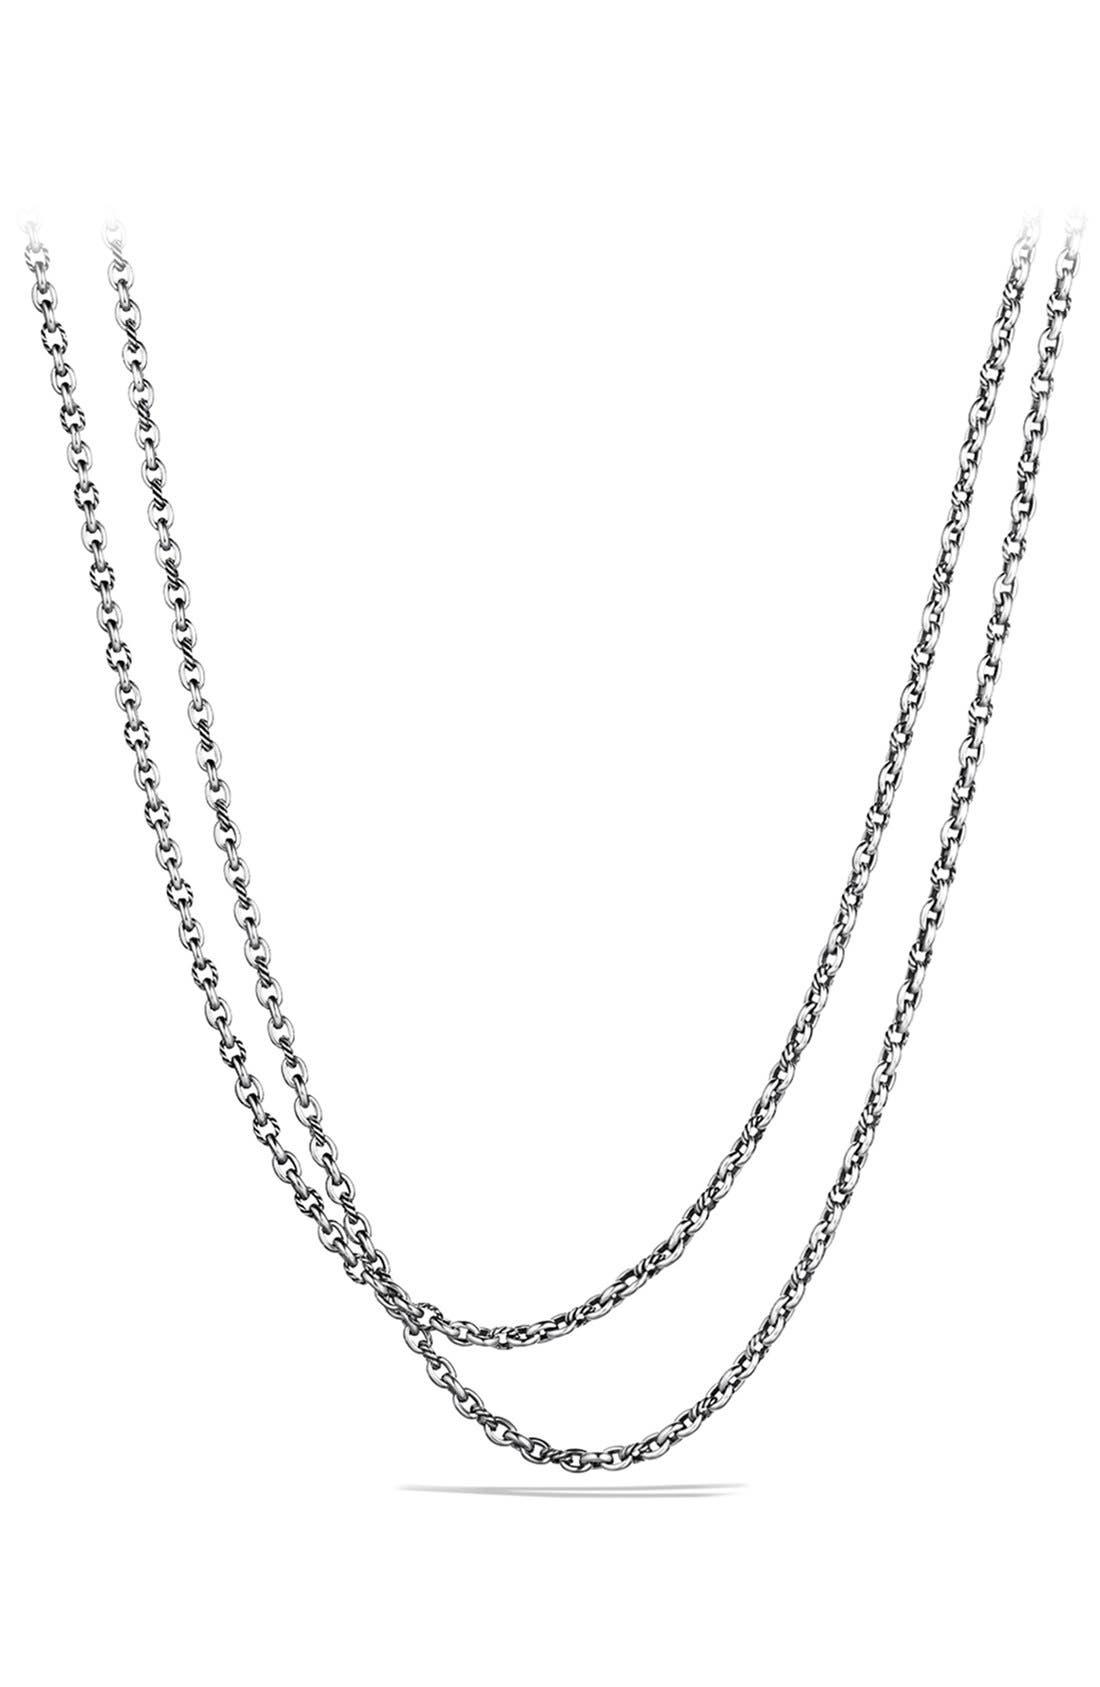 Main Image - David Yurman 'Oval' Link Necklace